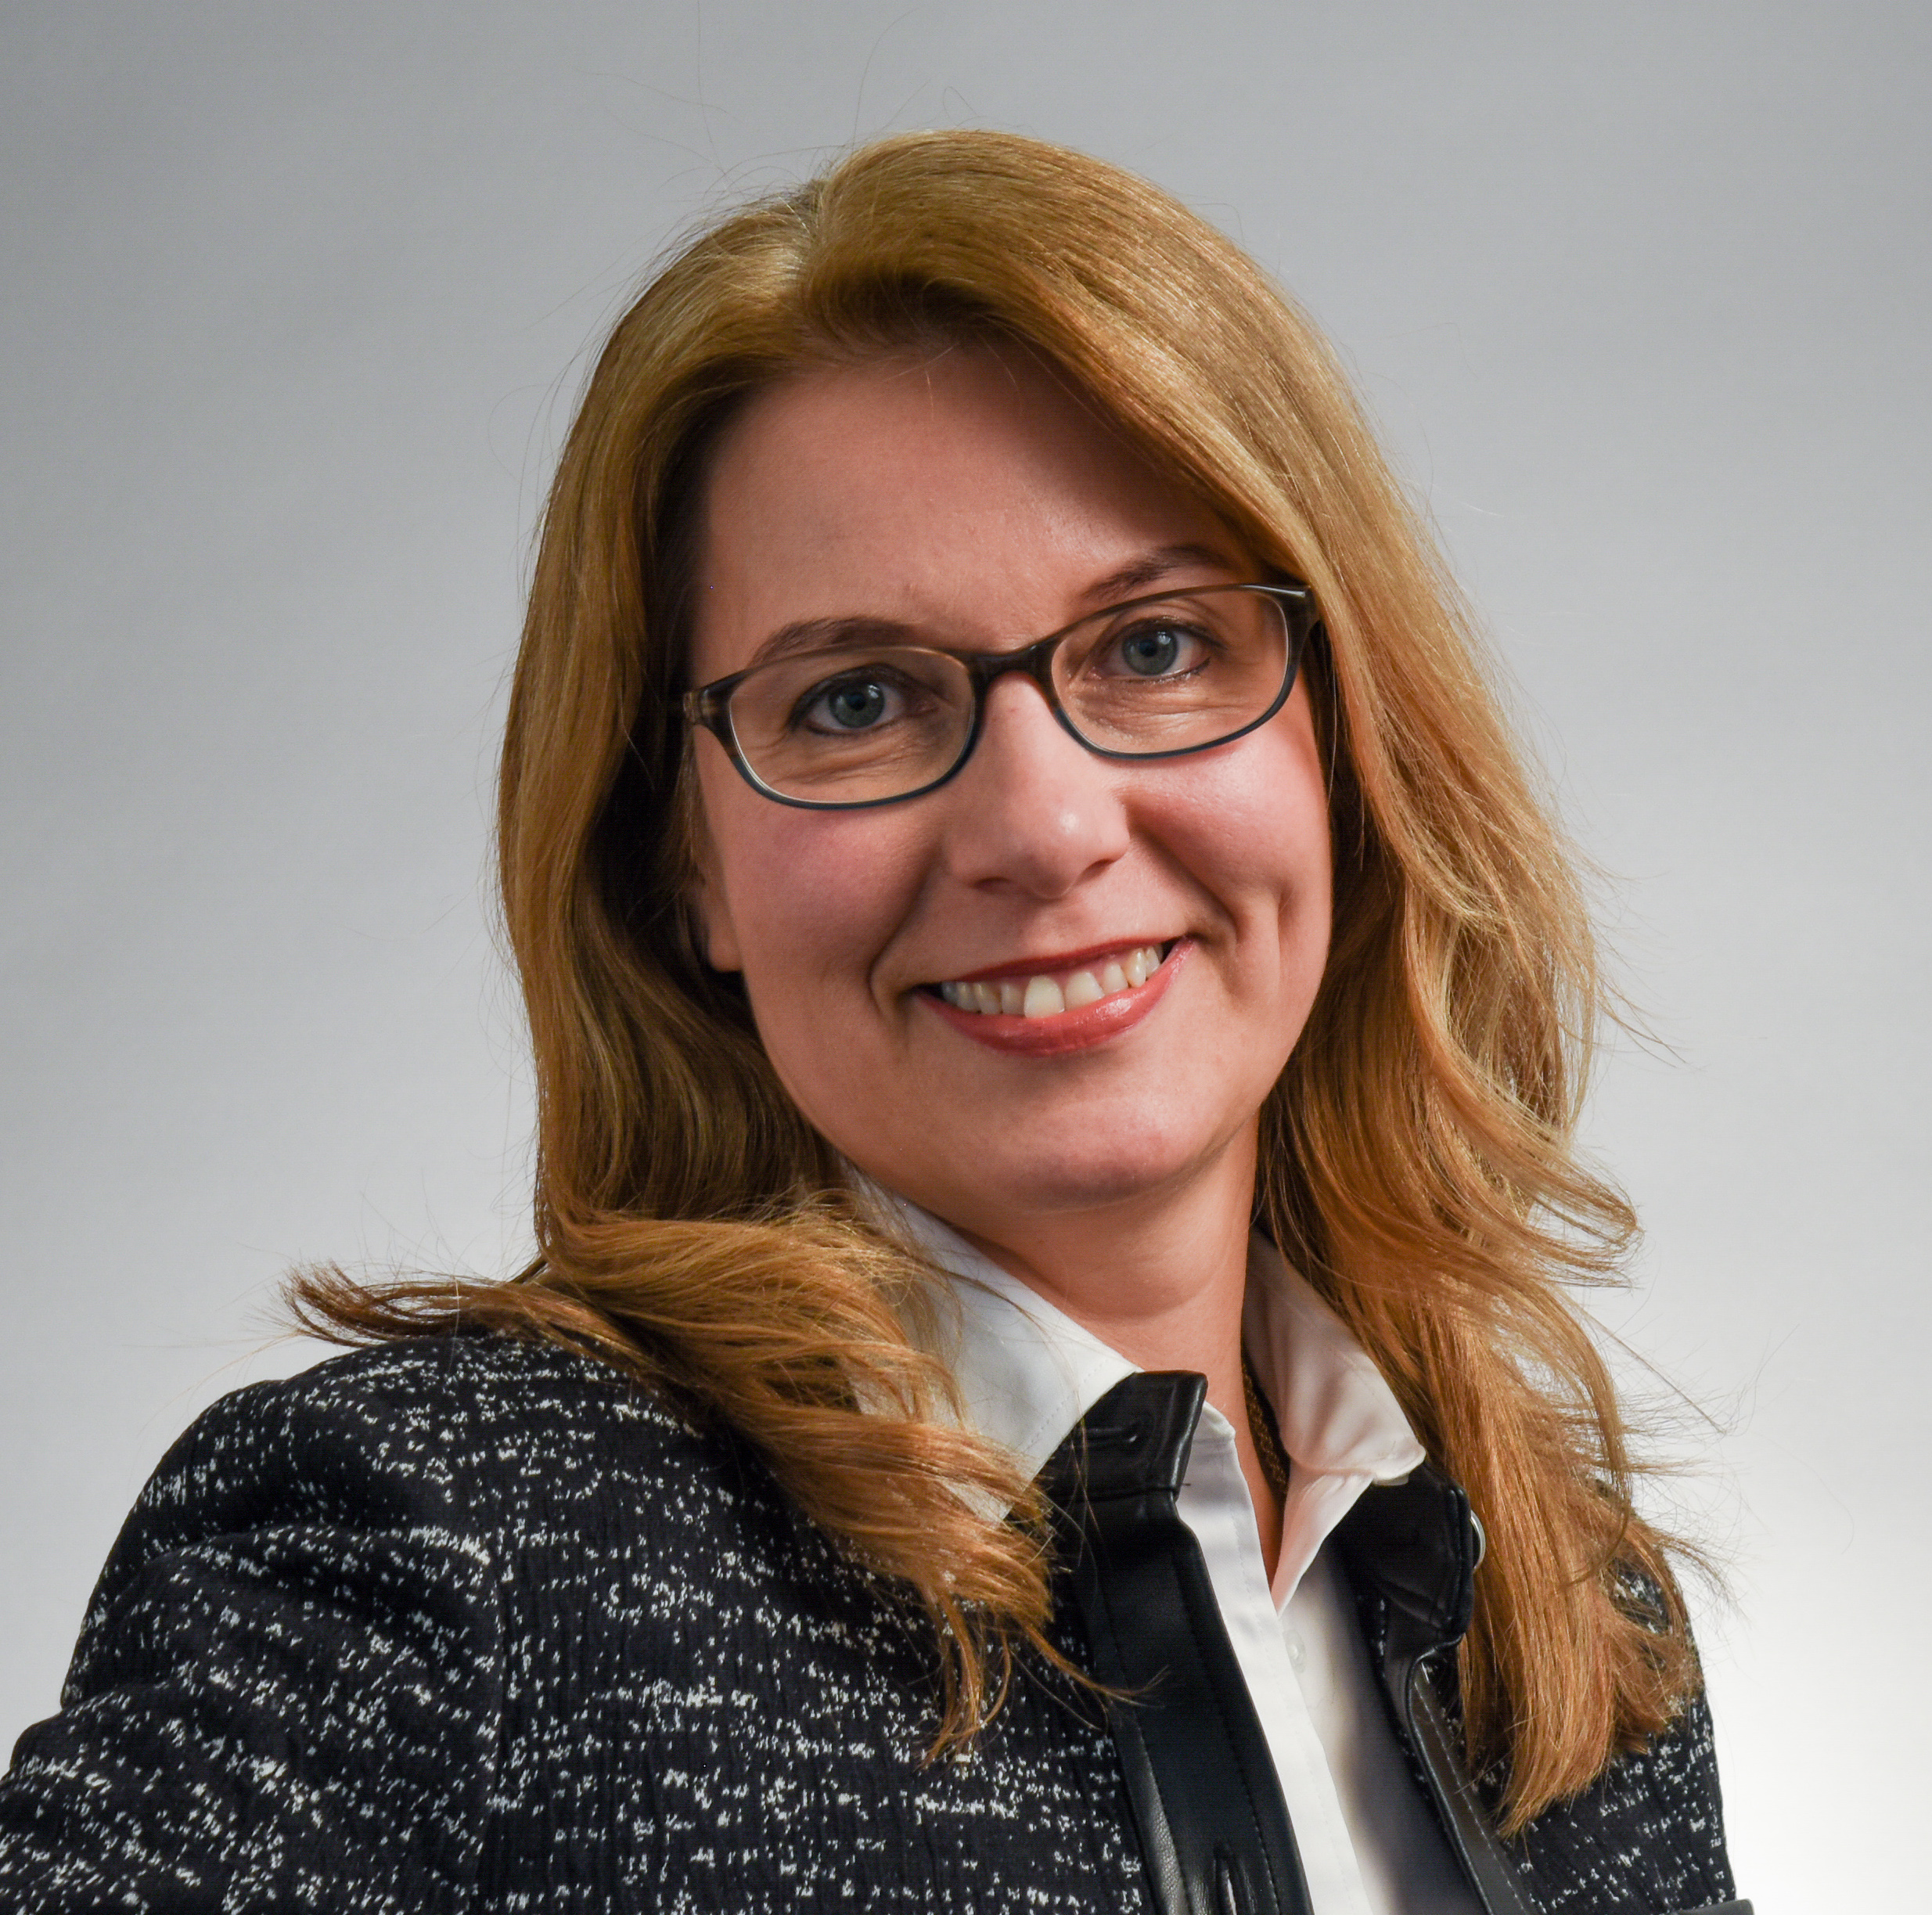 Ana Bastiani-Posner